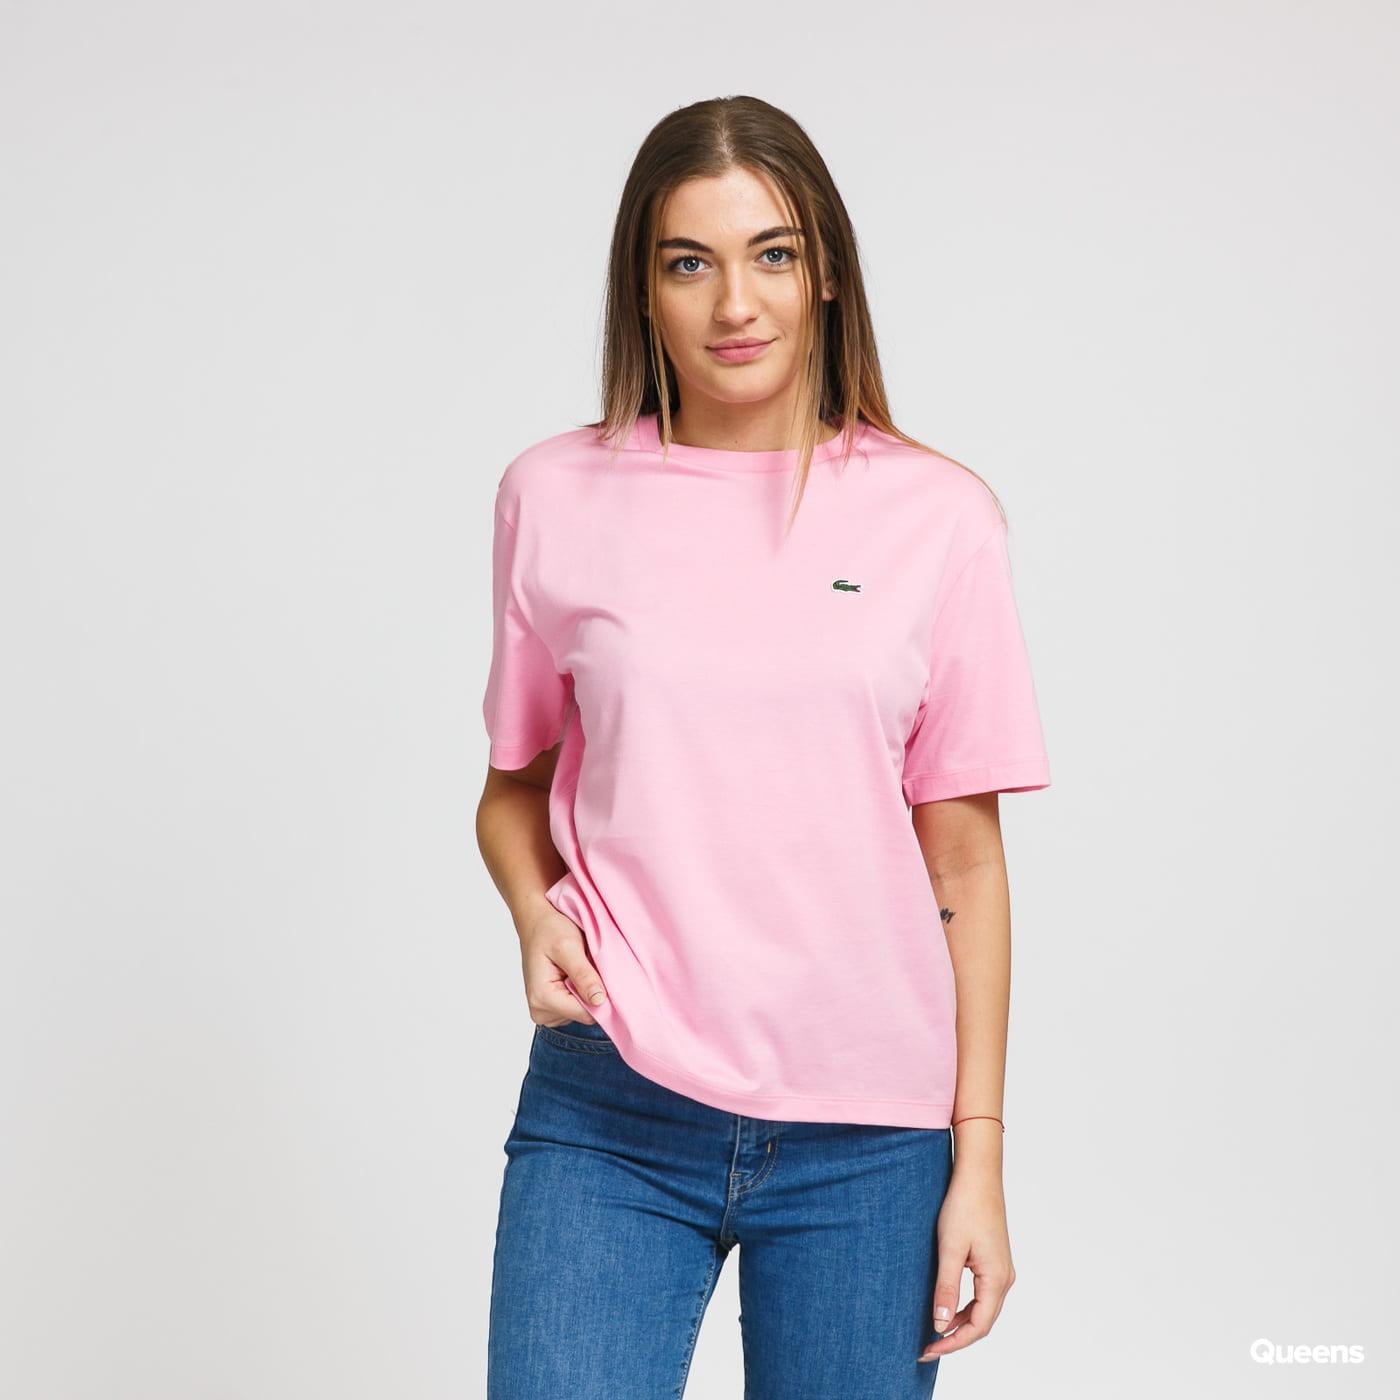 LACOSTE Women's T-Shirt růžové